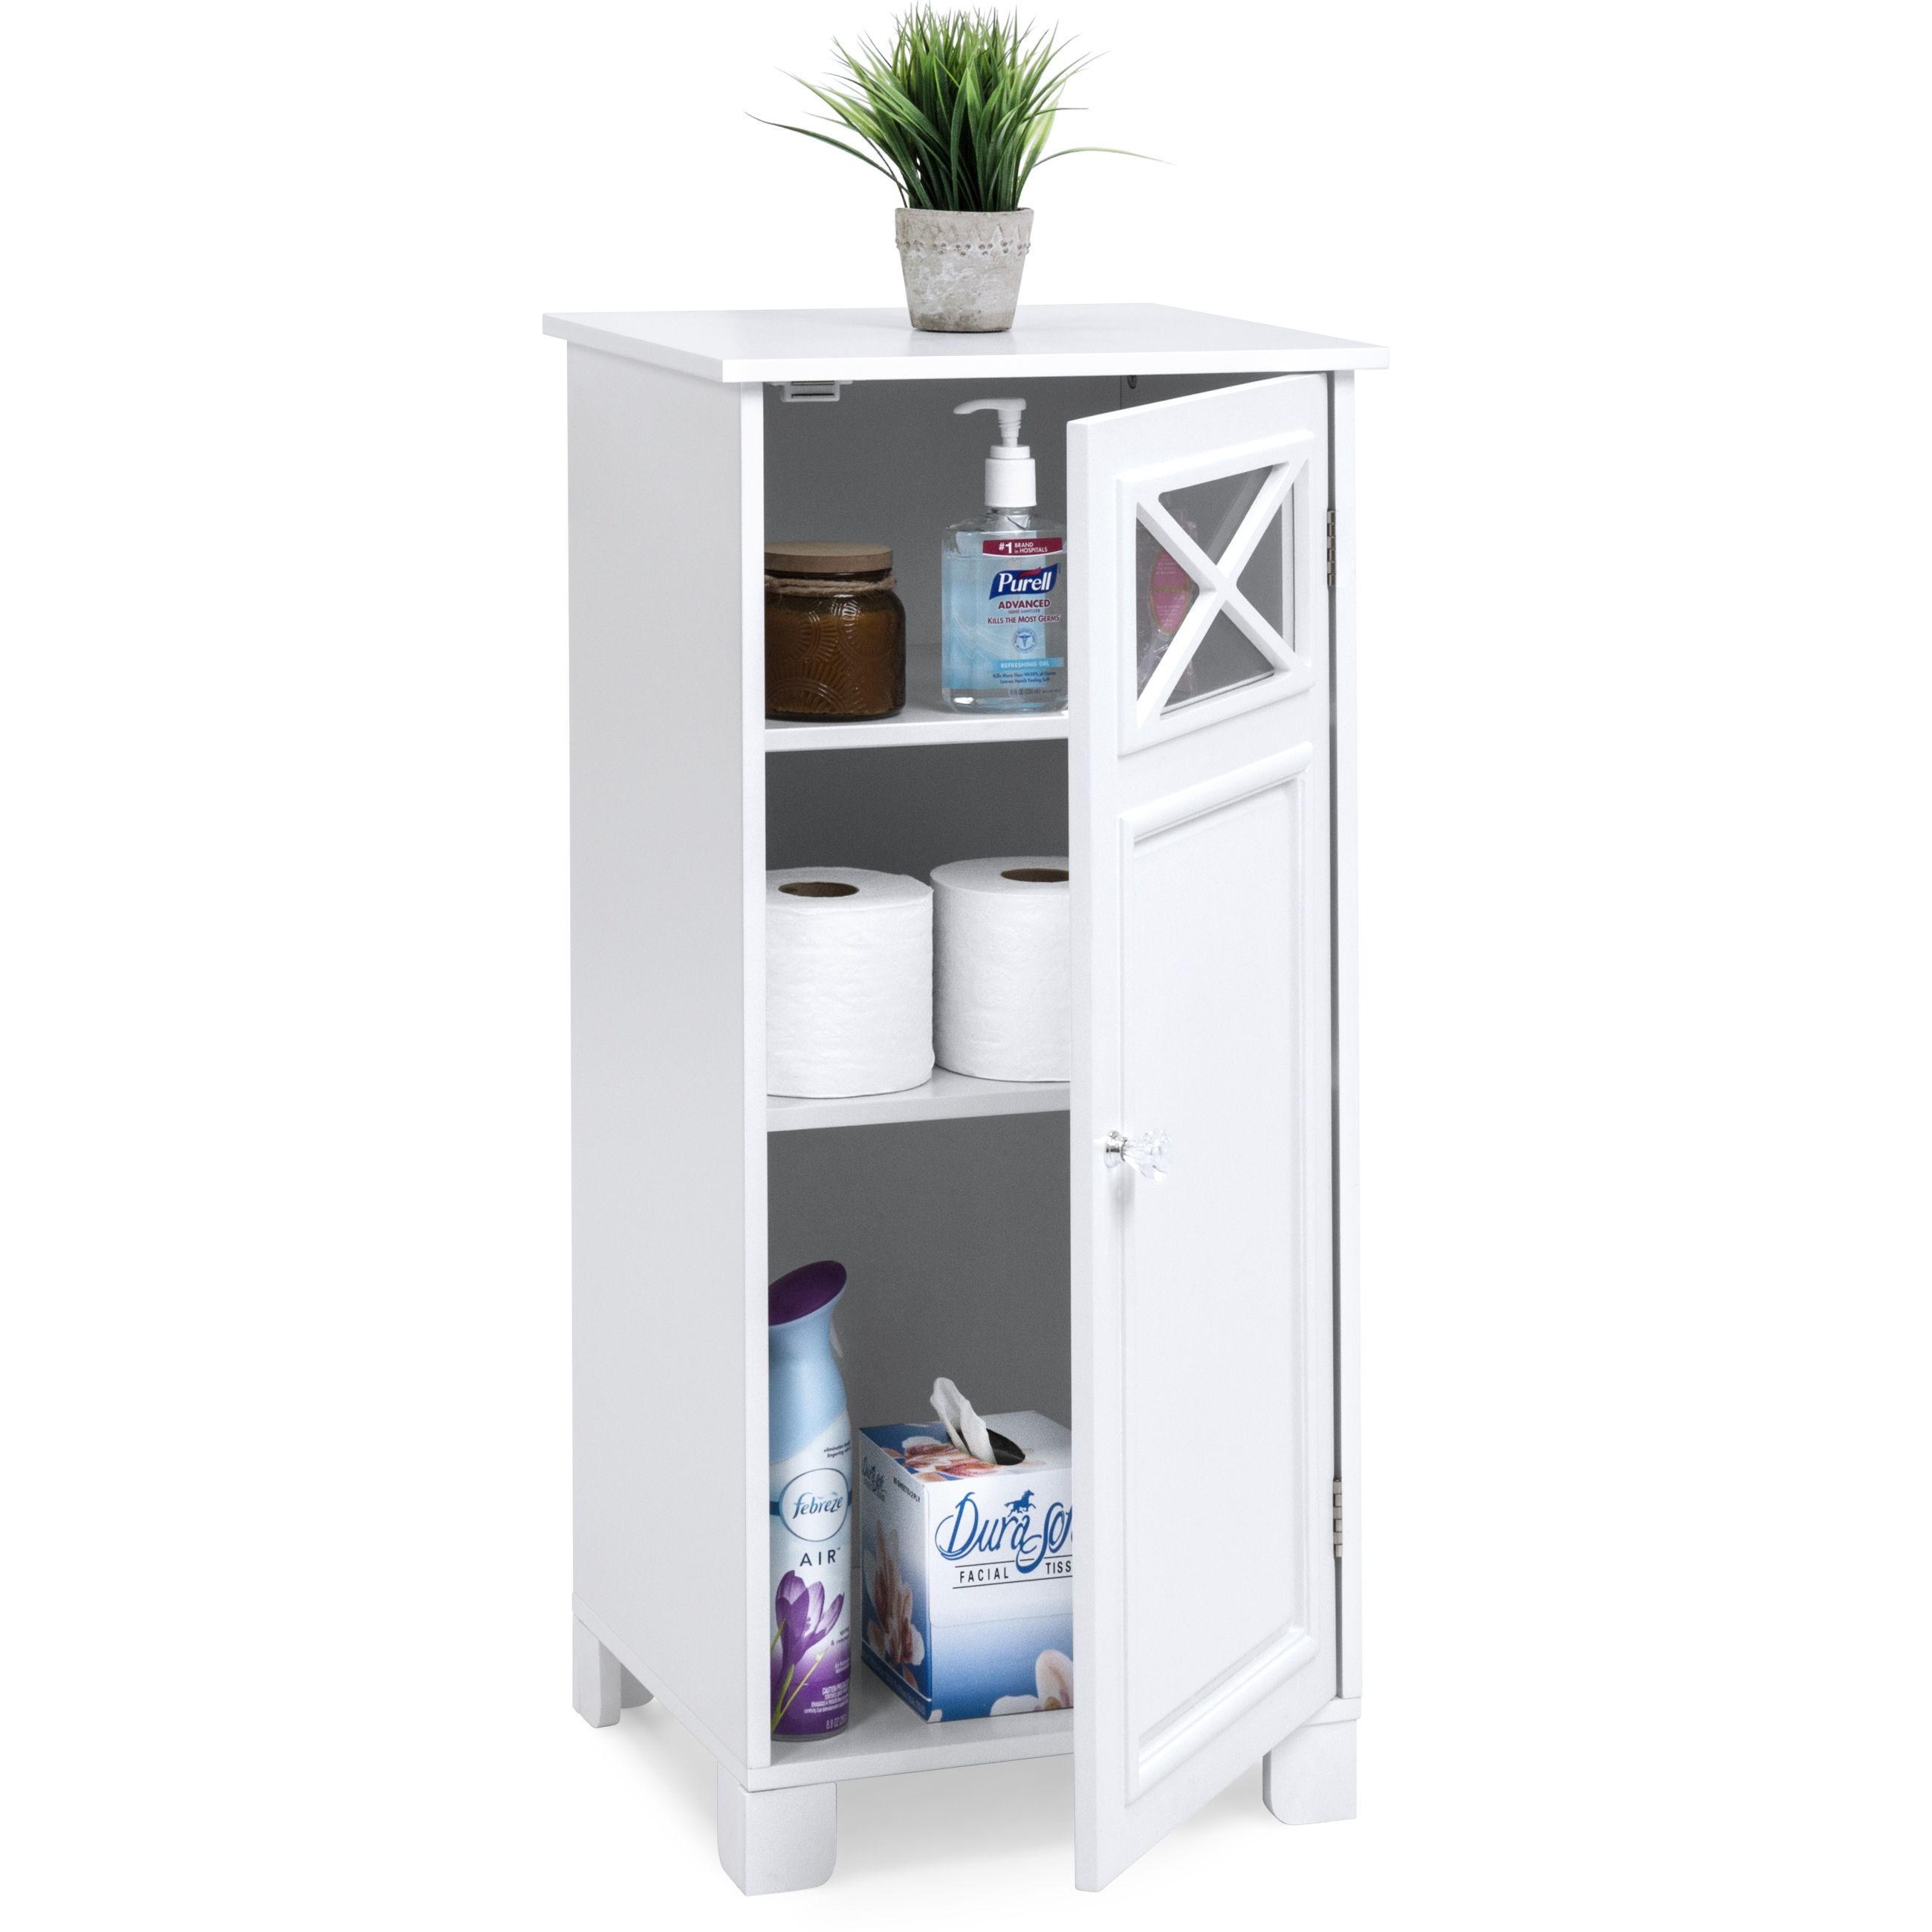 Best Choice Products 3 Tier Wooden Floor Cabinet For Bathroom Storage And Organization W Adjustable Shelves White Walmart Com White Bathroom Storage Bathroom Floor Storage Cabinet Bathroom Floor Storage